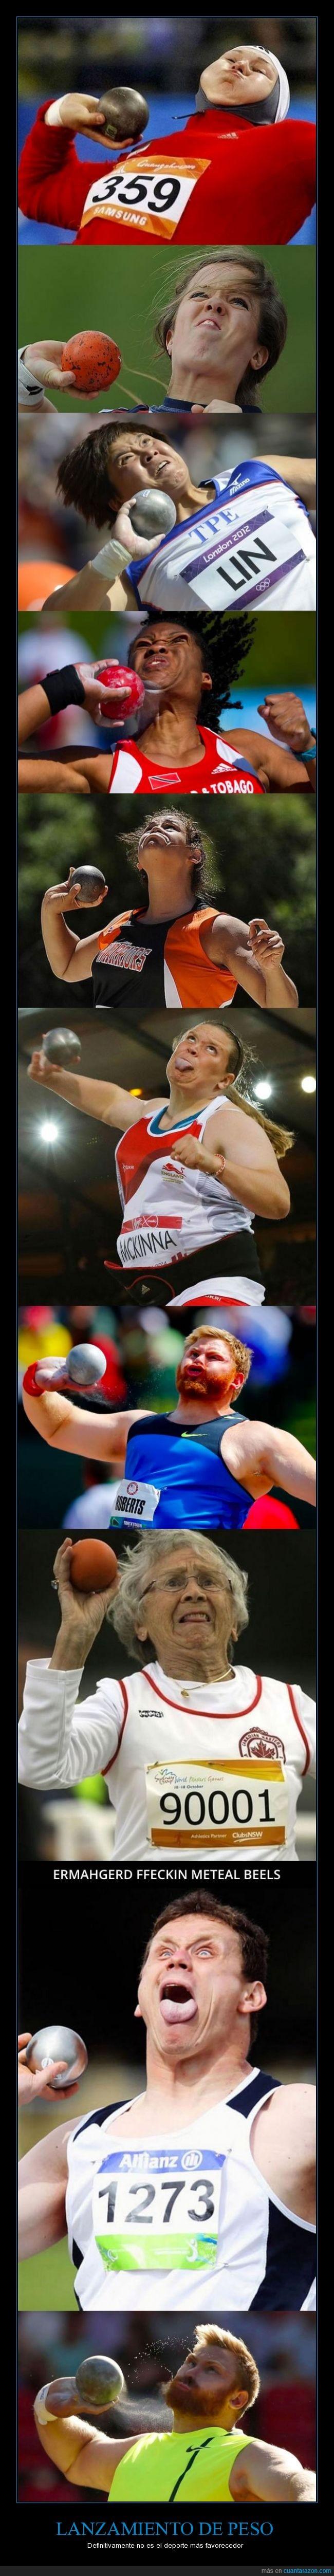 cara fotogenia,deporte,expresión,fea,feo,jeto,lanzamiento,peso,tirar